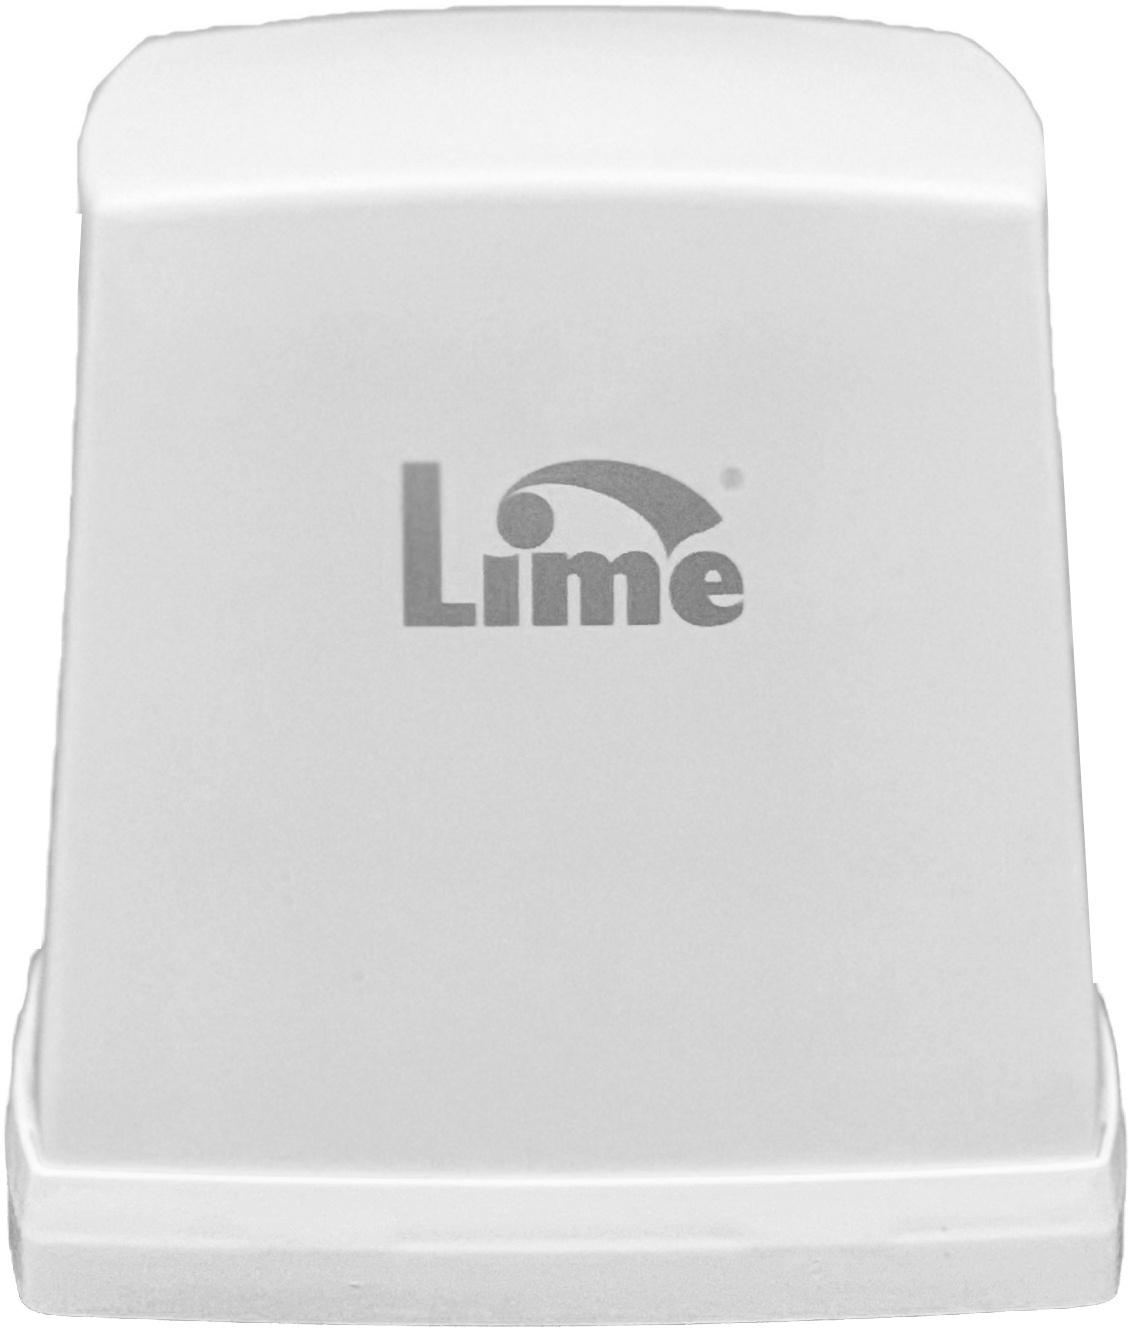 Диспенсер настольный для салфеток LIME, цвет белый